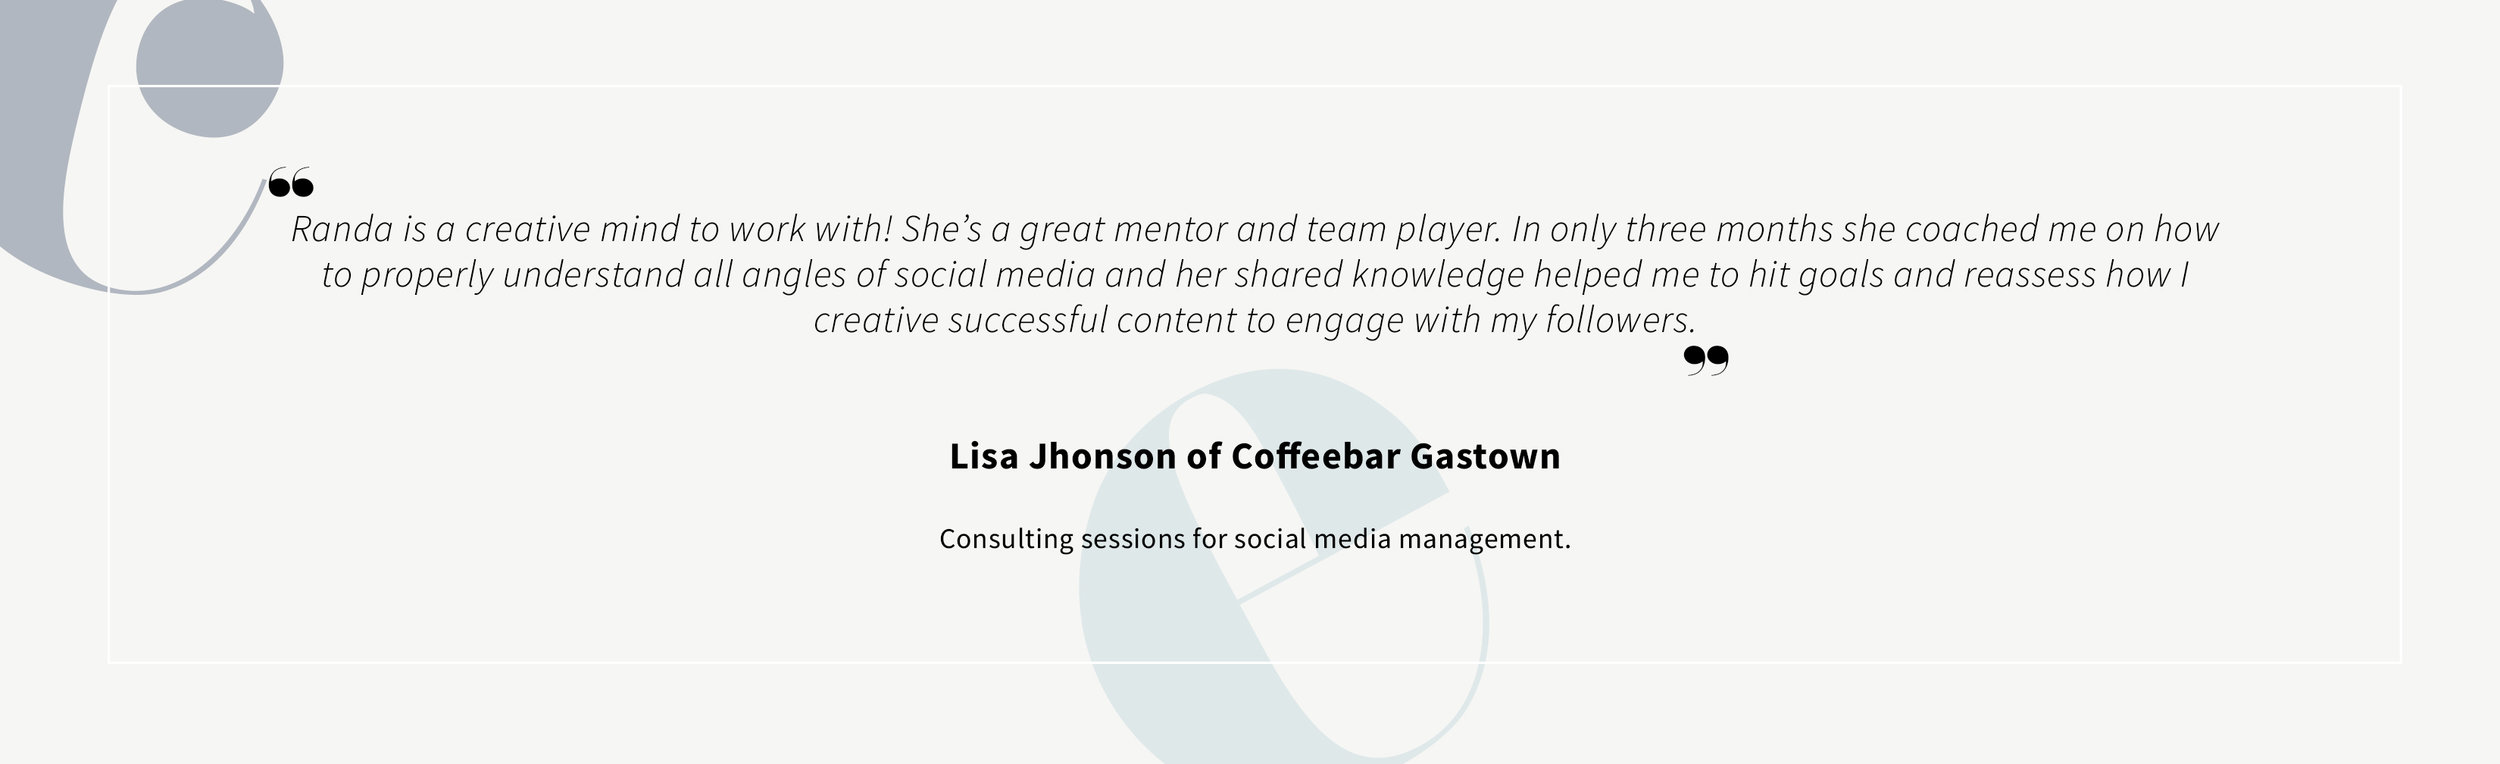 Lisa J of Coffeebar Gastown Testimonial.jpg